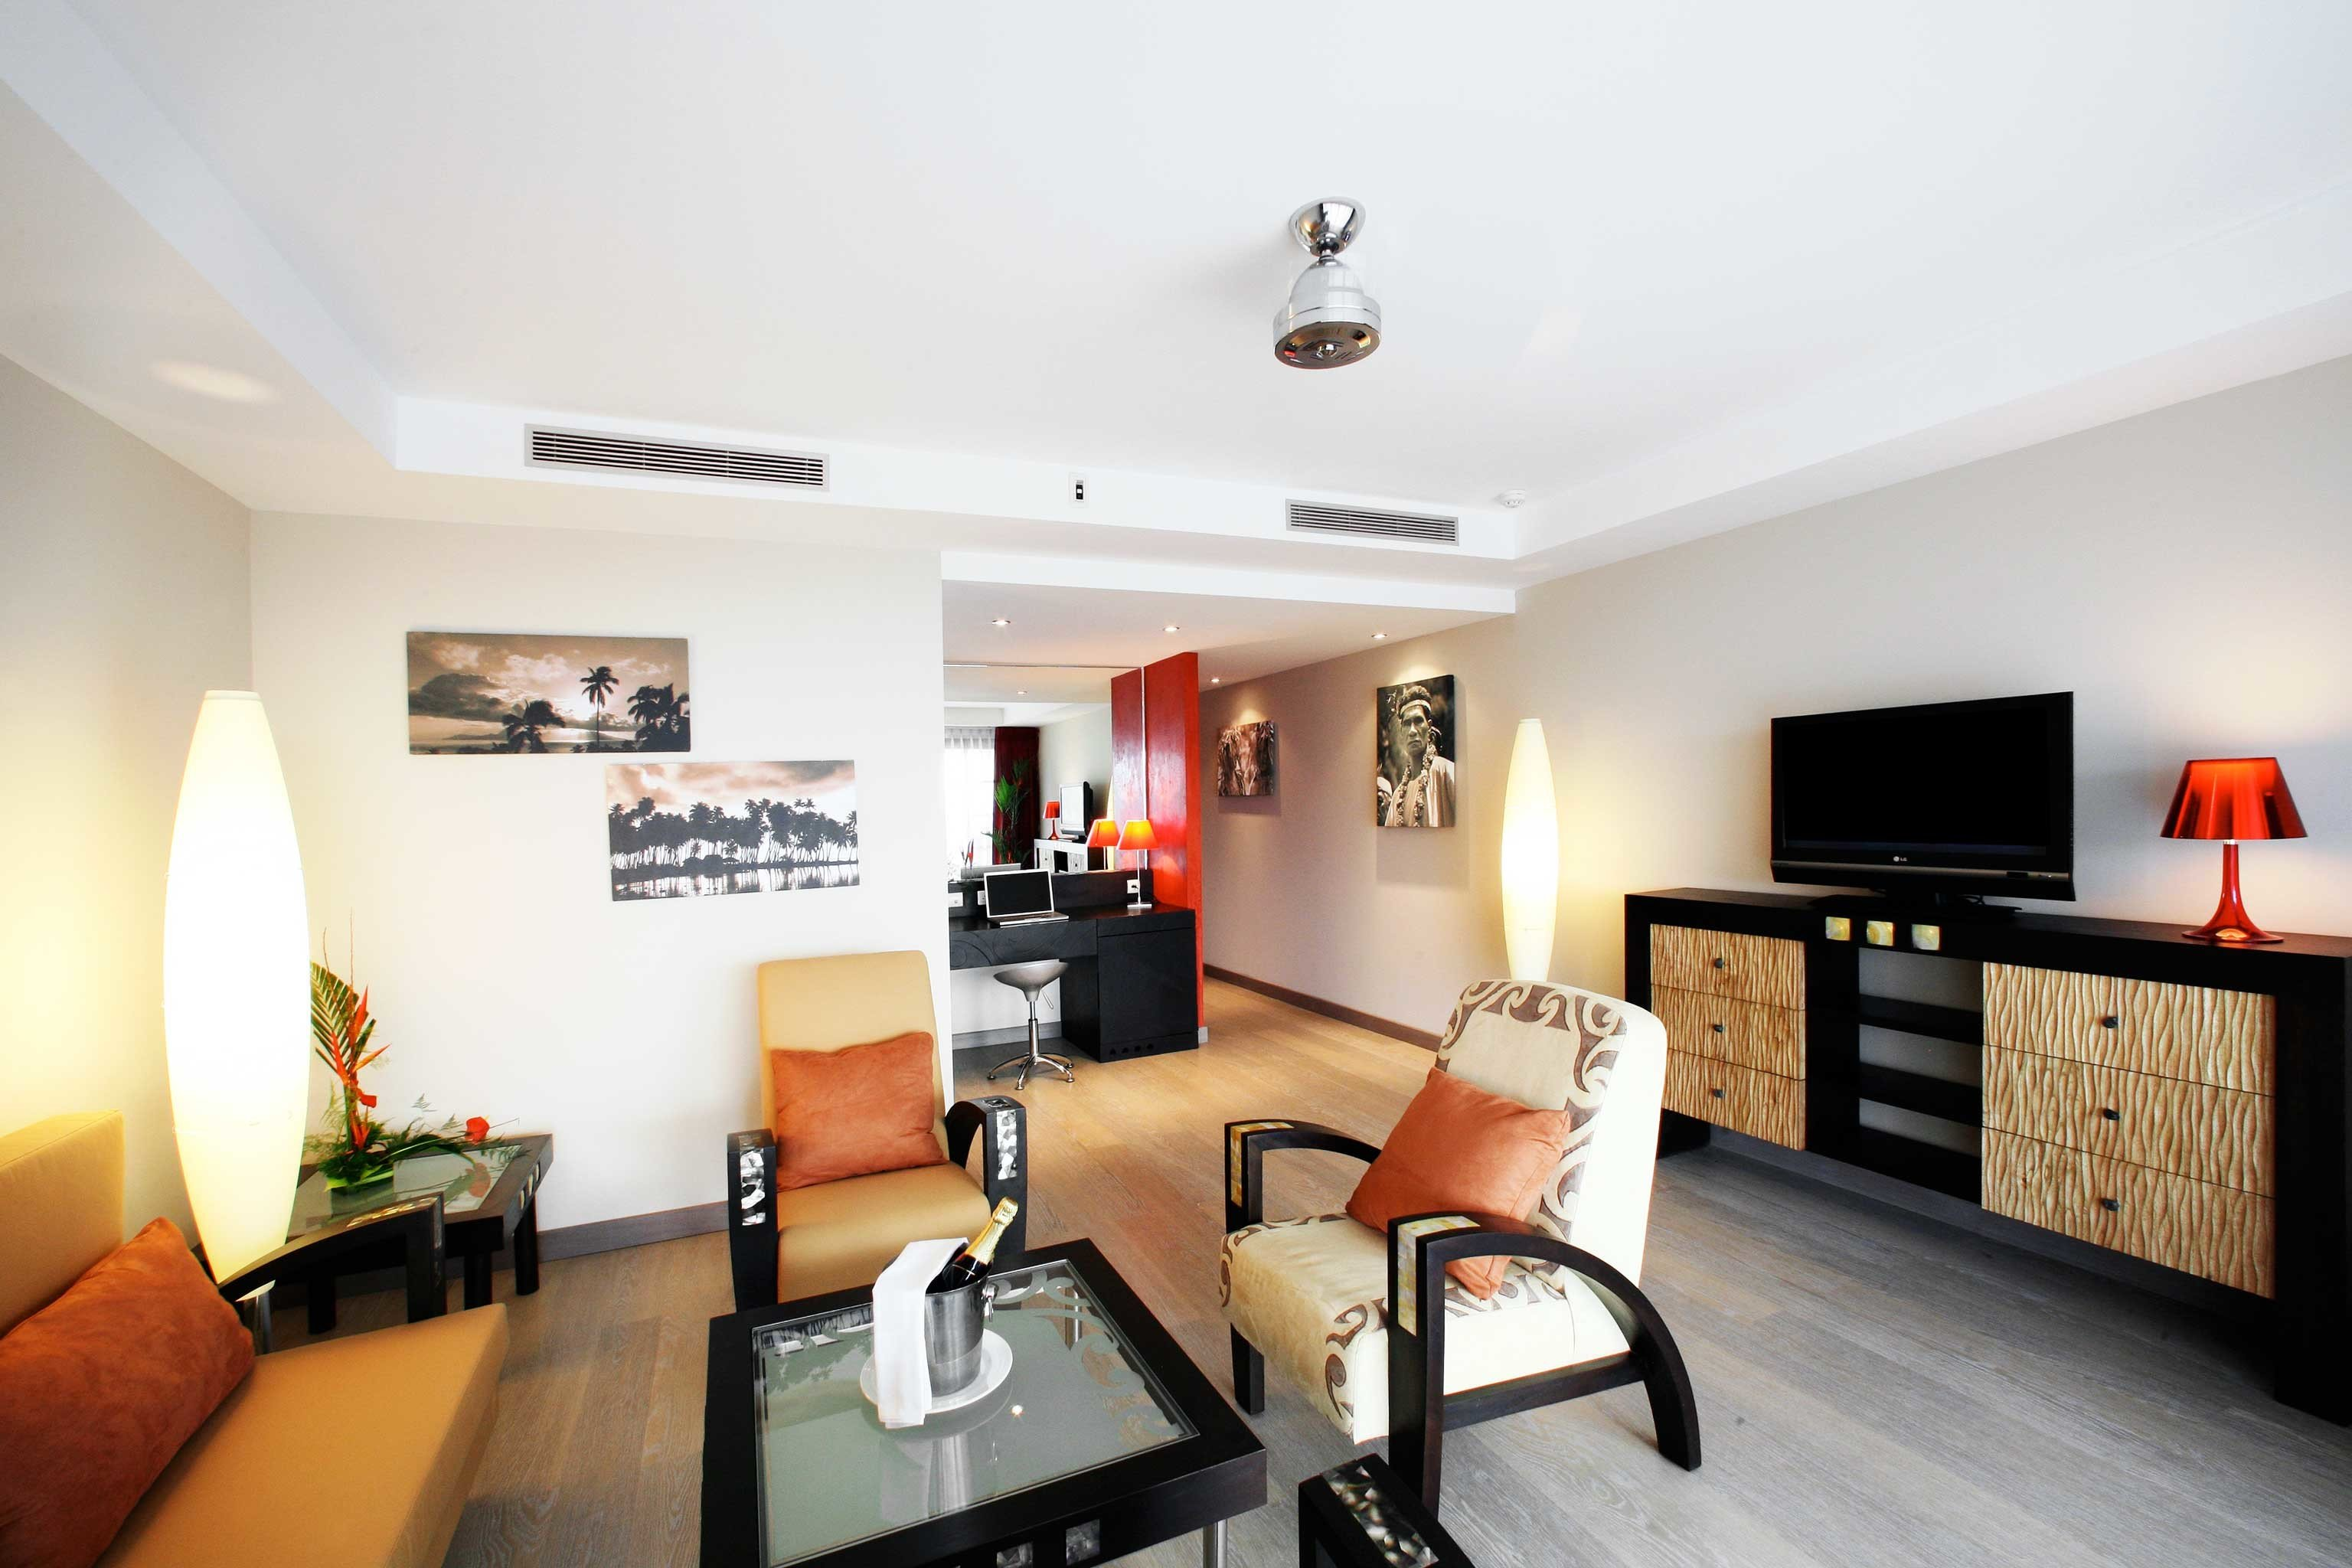 Eco Modern sofa property living room home Suite condominium loft recreation room cottage flat leather